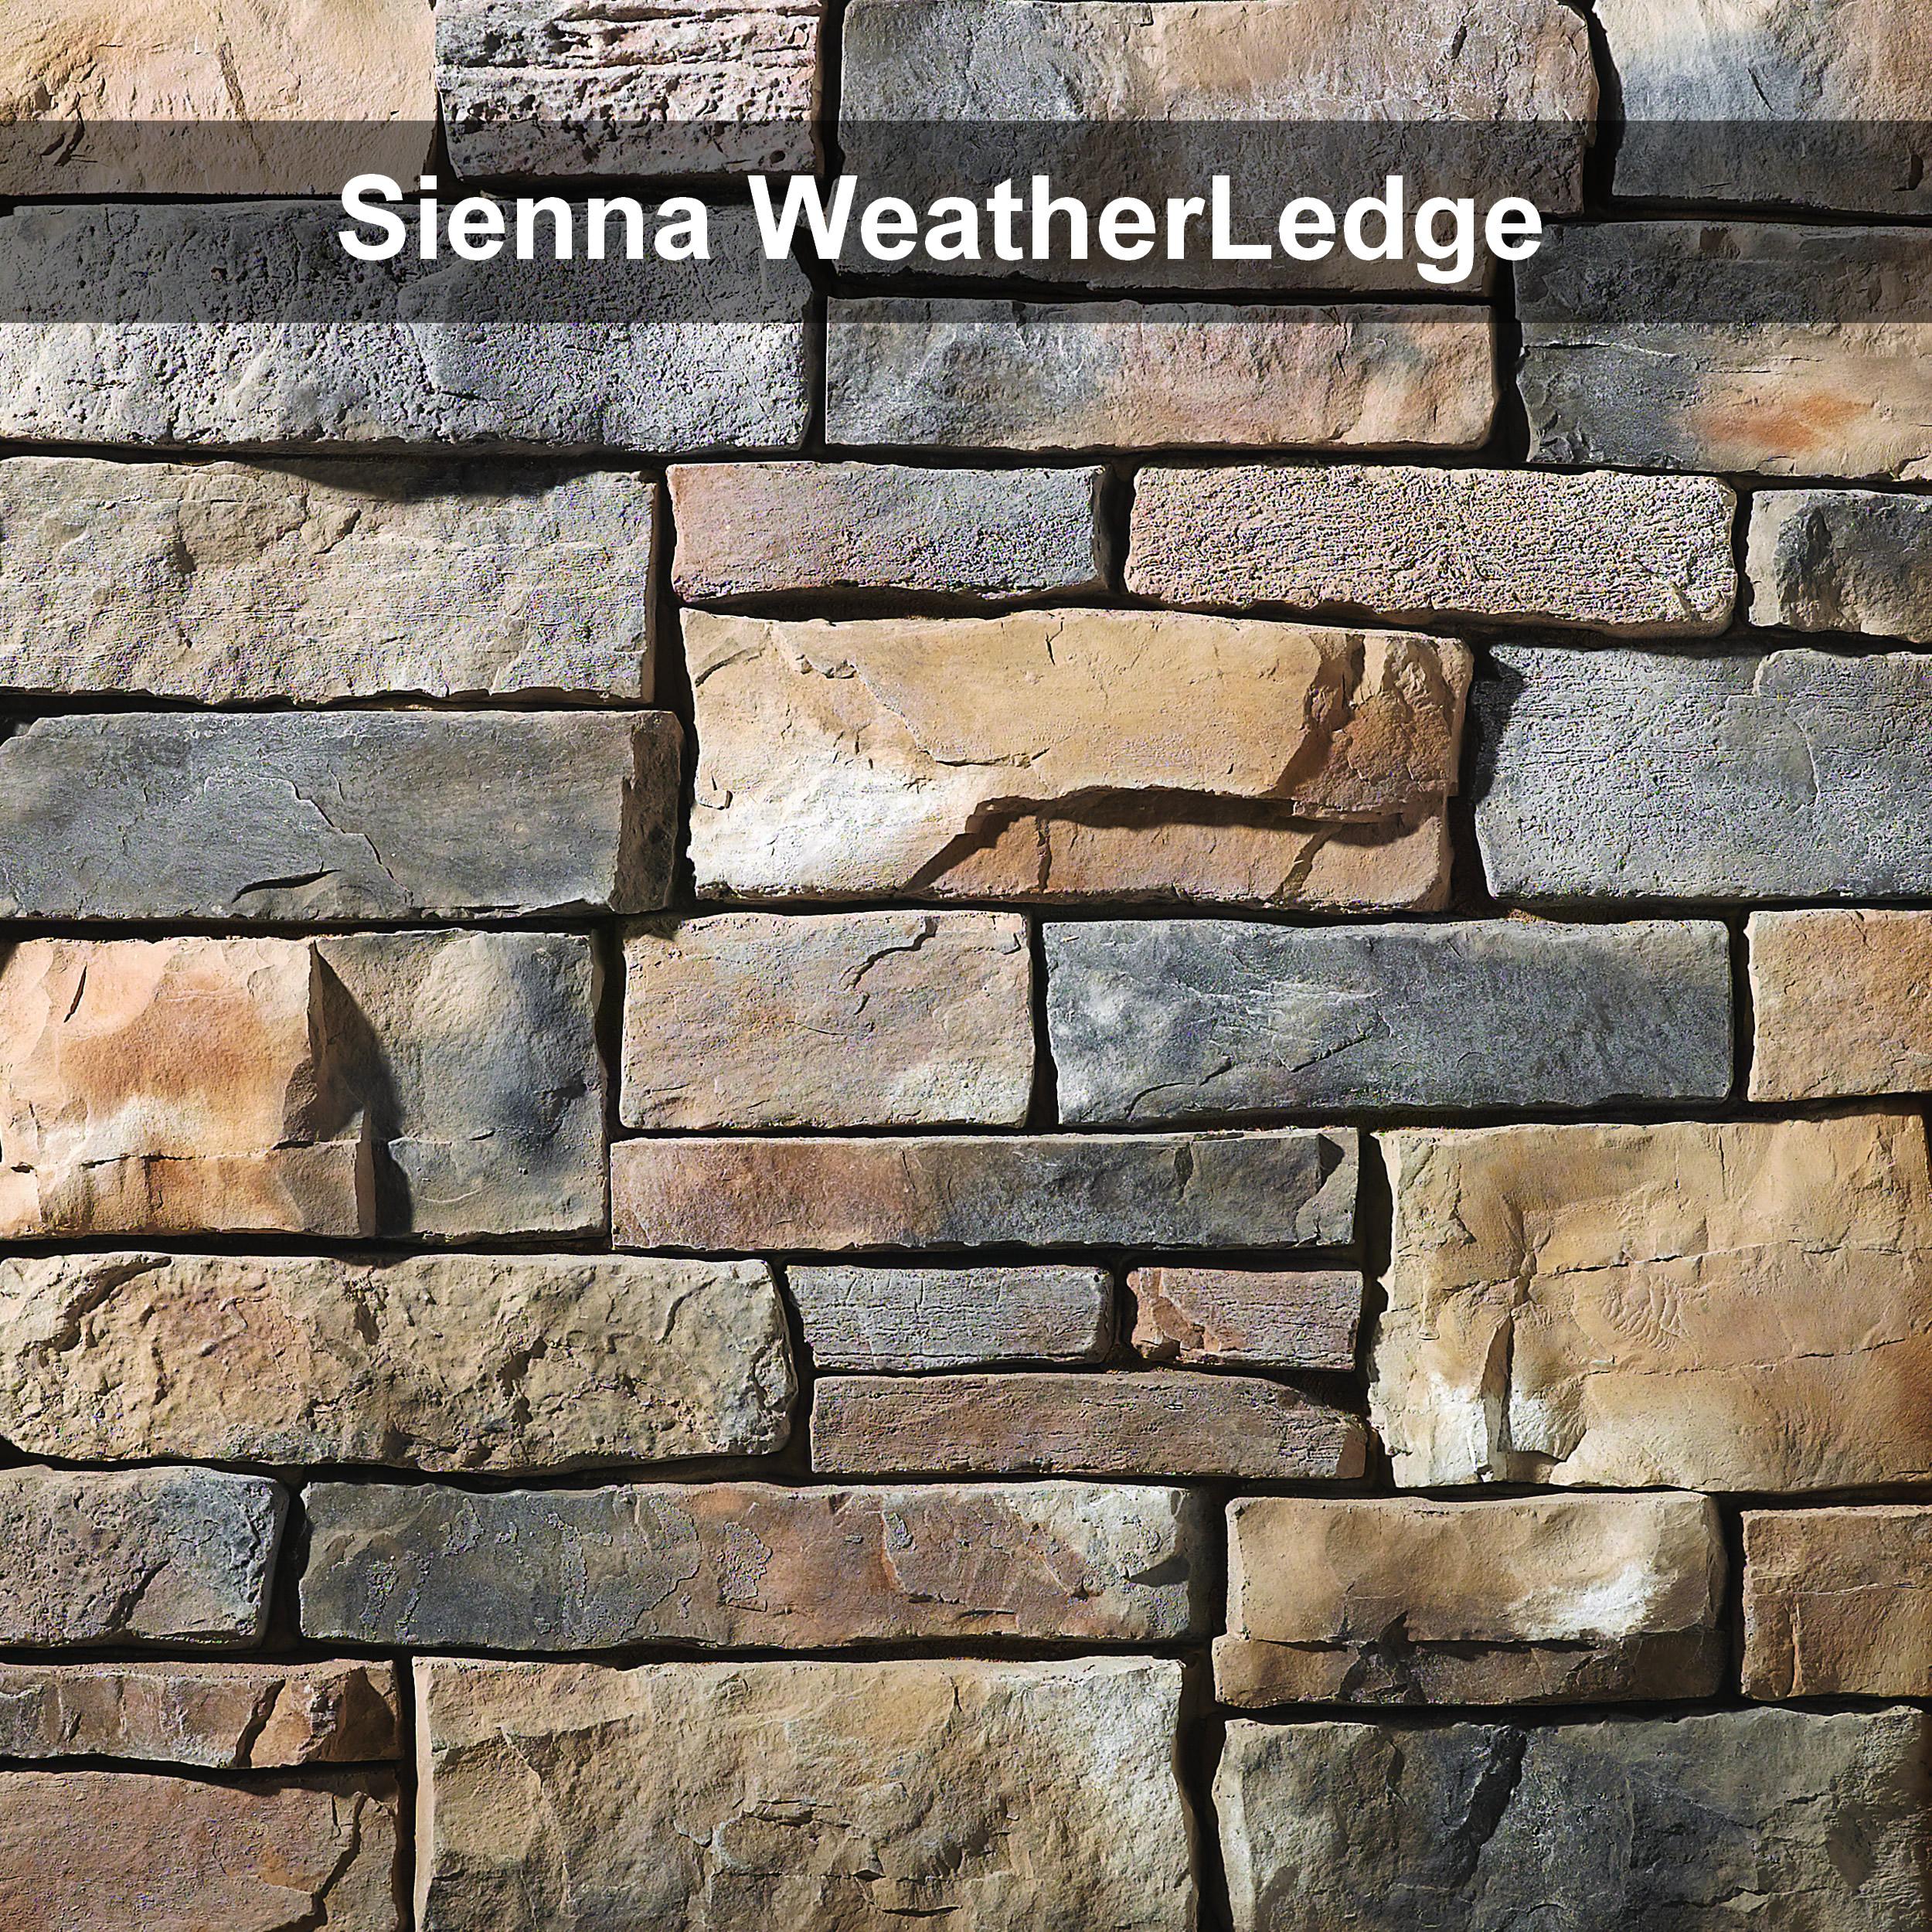 DQ_Weather Ledge_Sienna_Profile.jpg